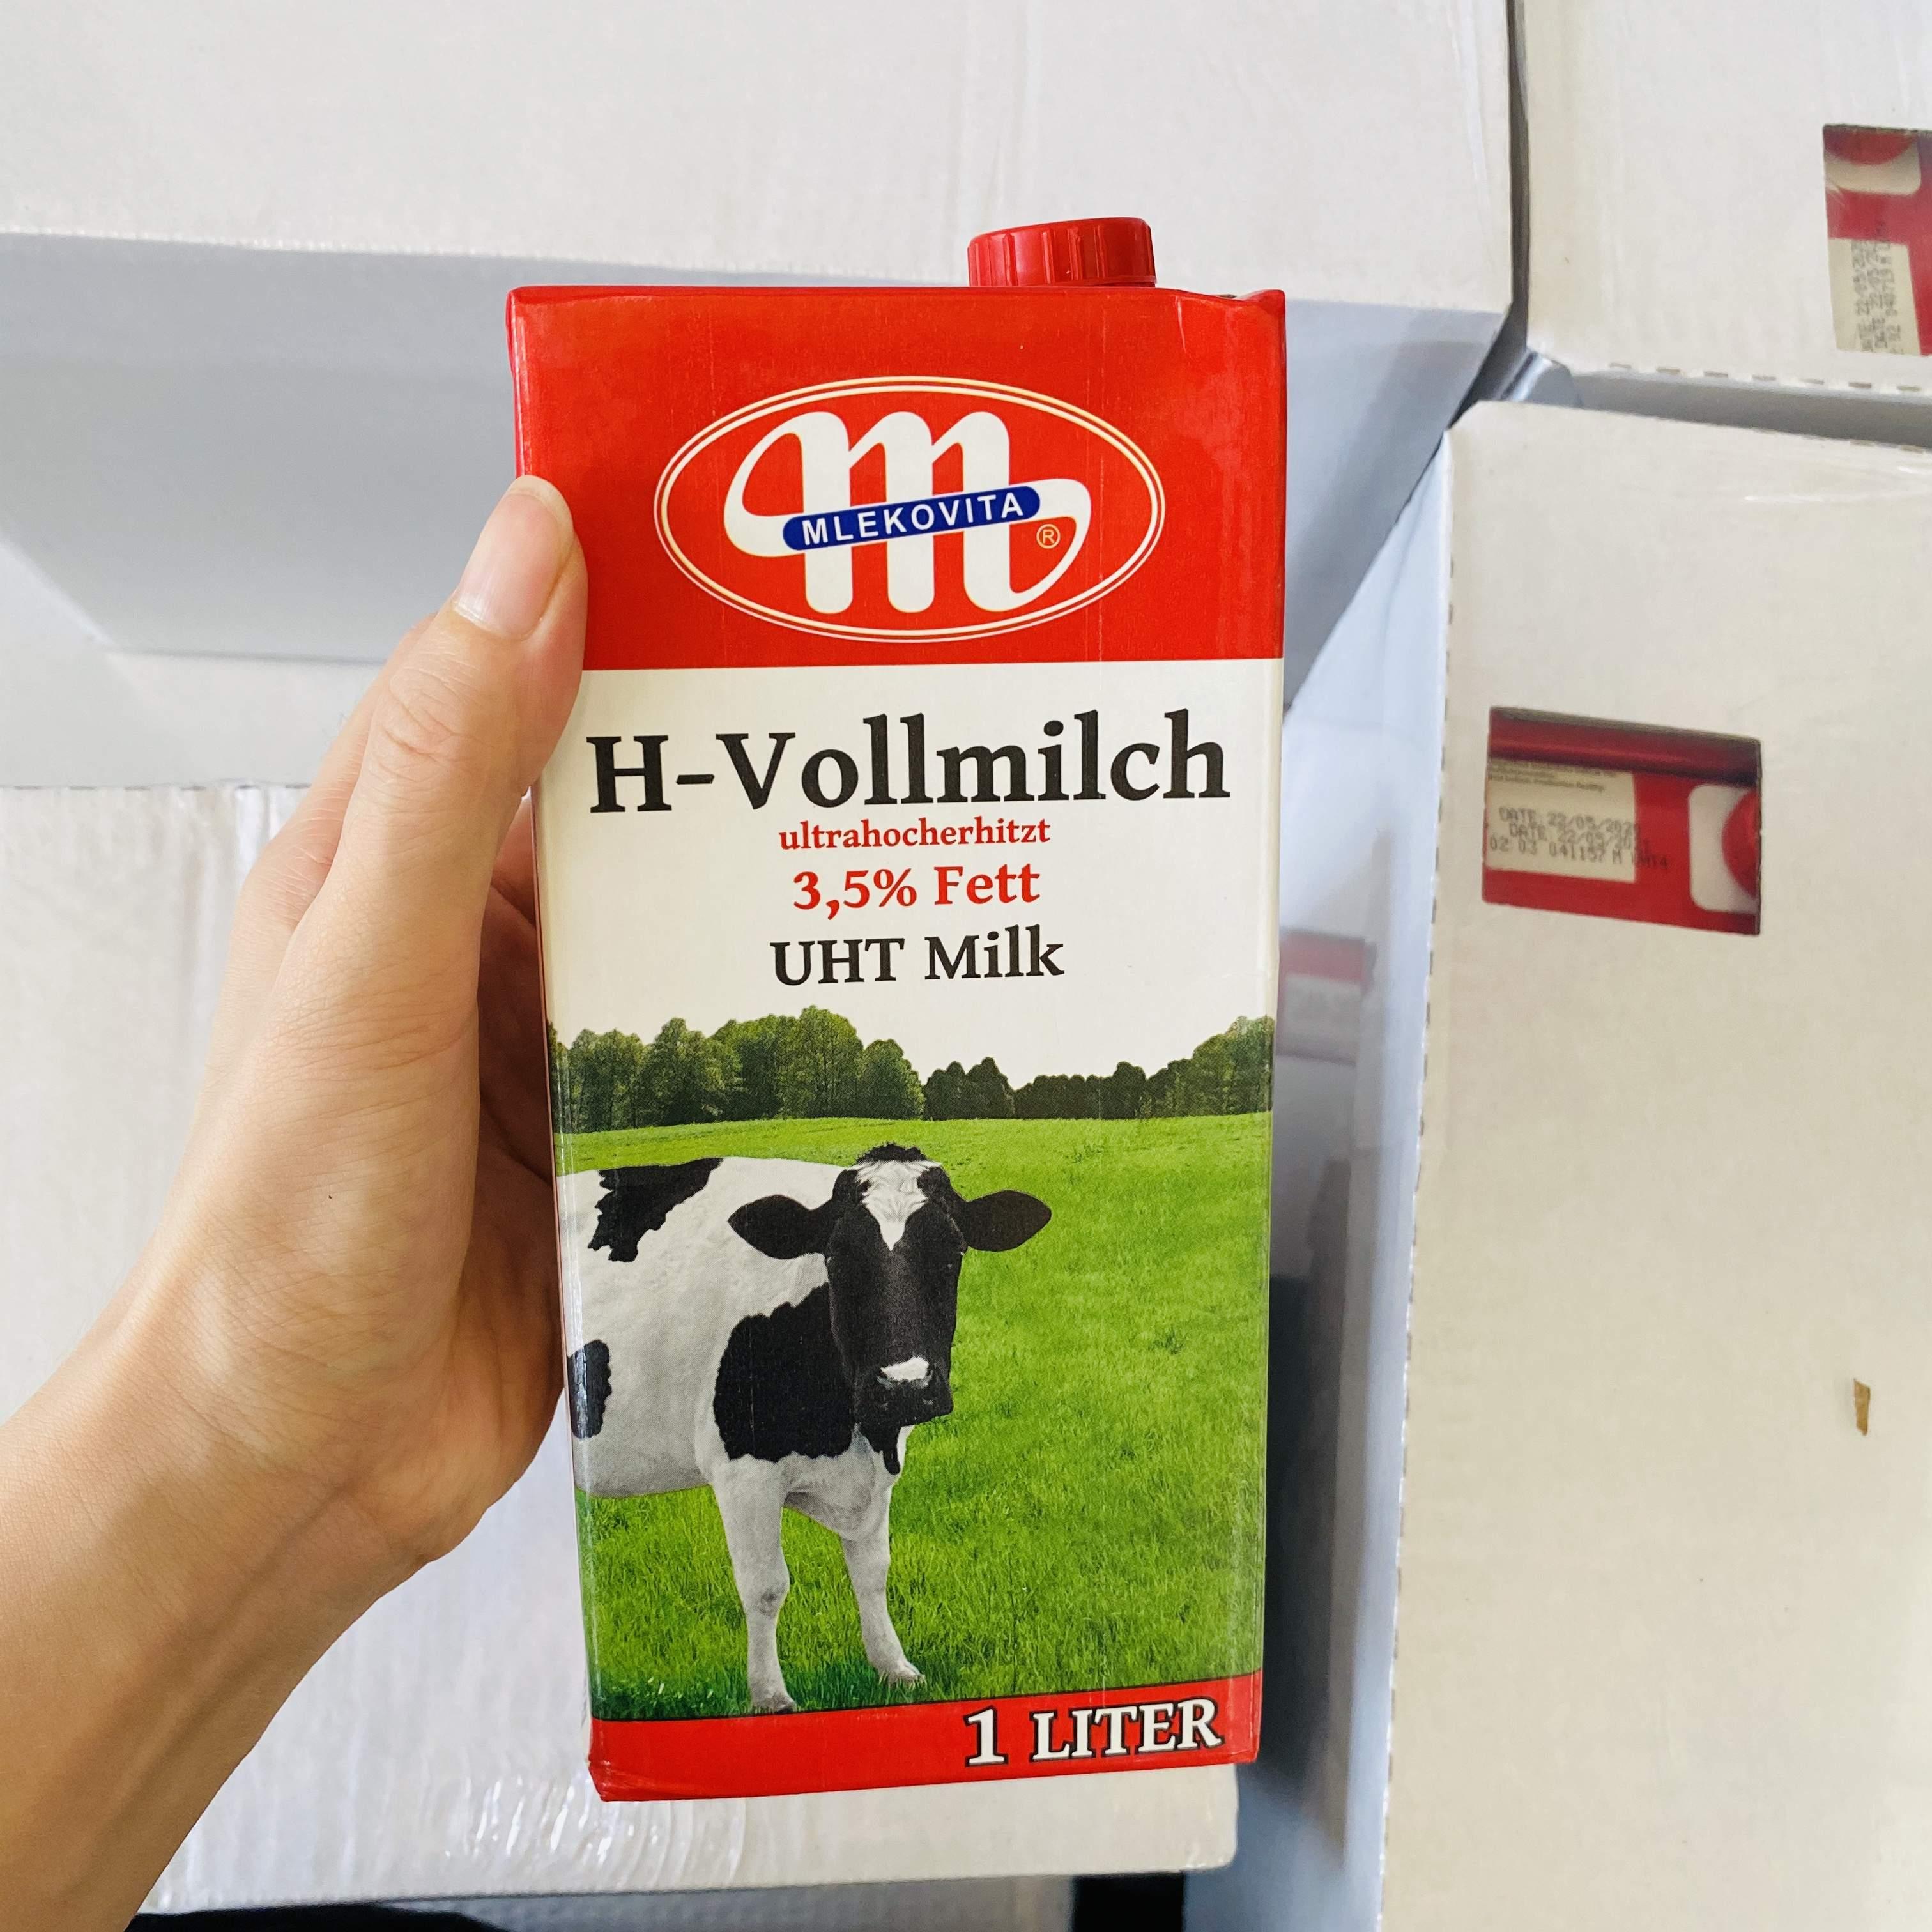 Big M imported mlekovita full Fat Milk 1L from Poland, 12 boxes of Lindburg for baking milk tea